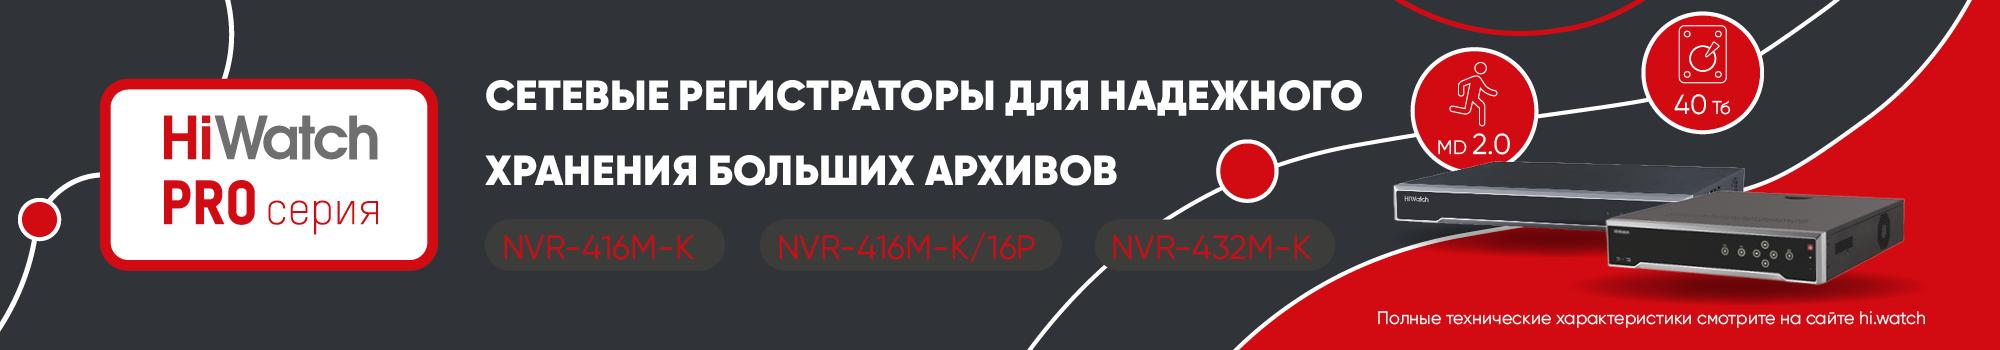 nvr_hiwatch_pro_web73